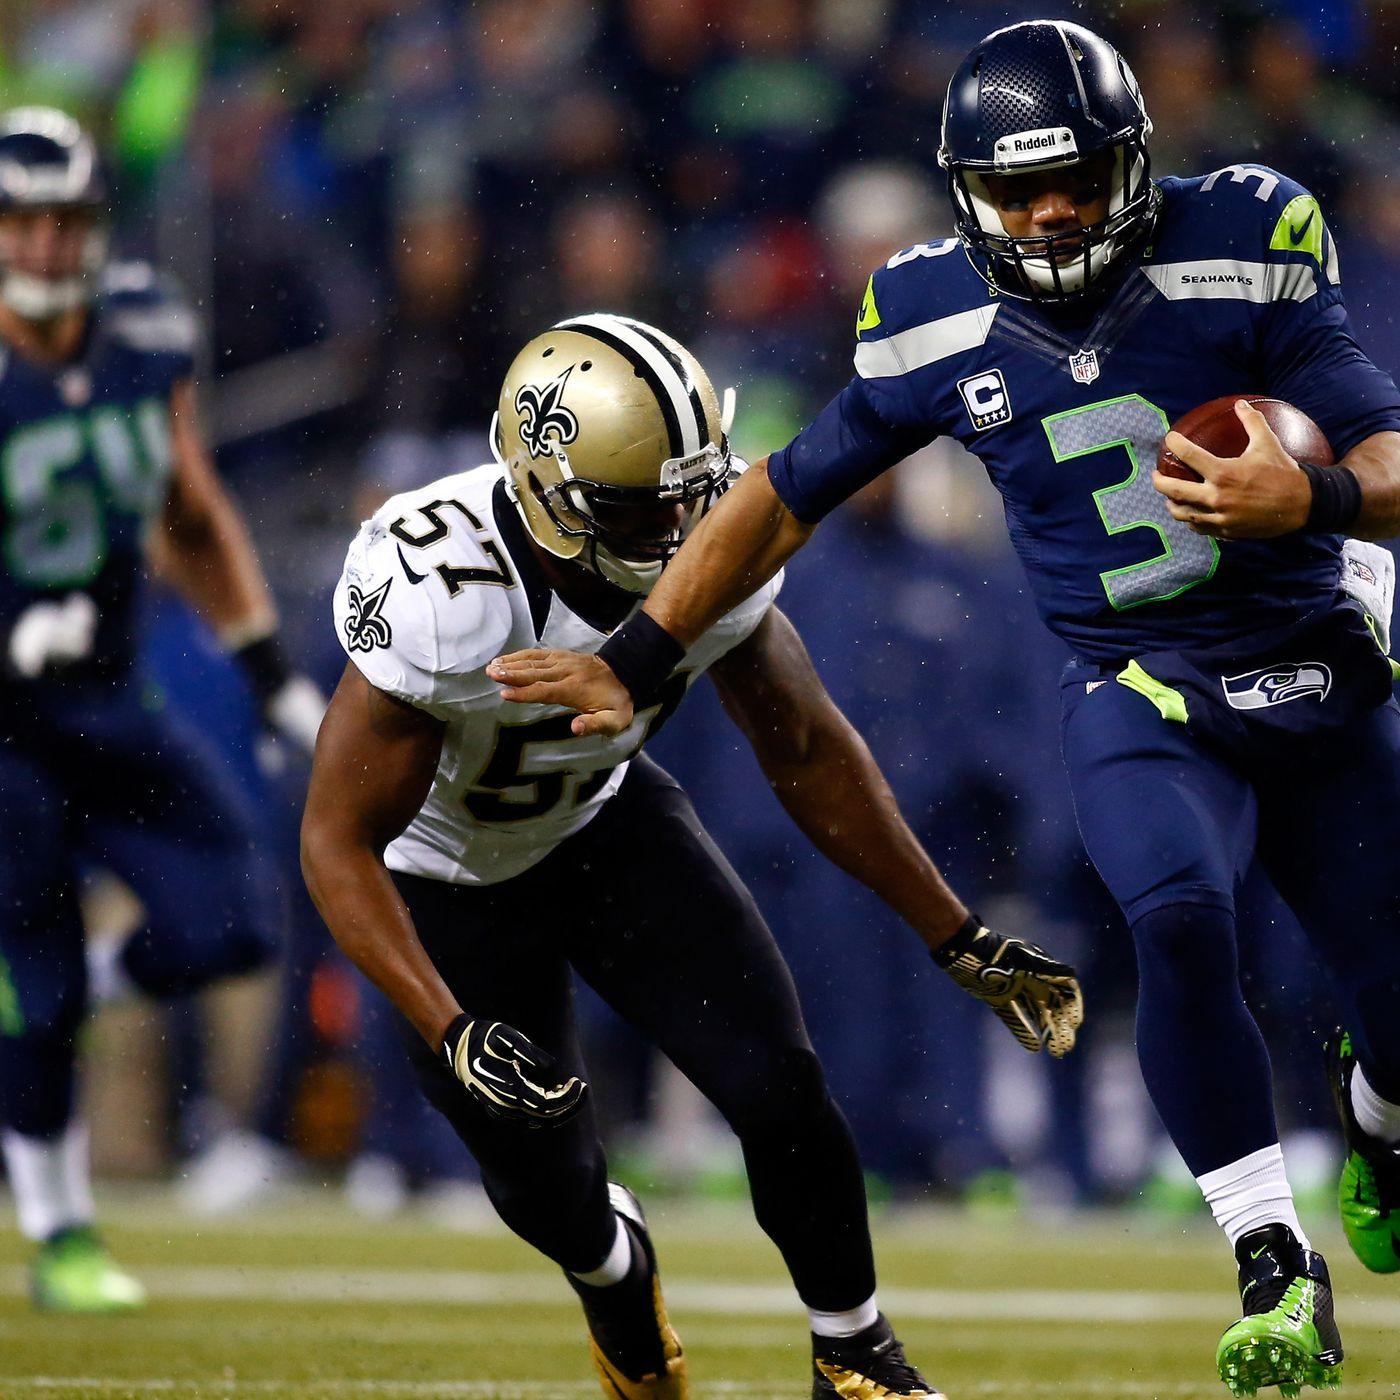 Saints Vs Seahawks Monday Night Football Final Score Seattle Russell Wilson Dominate Saints 34 7 Canal Street Chronicles